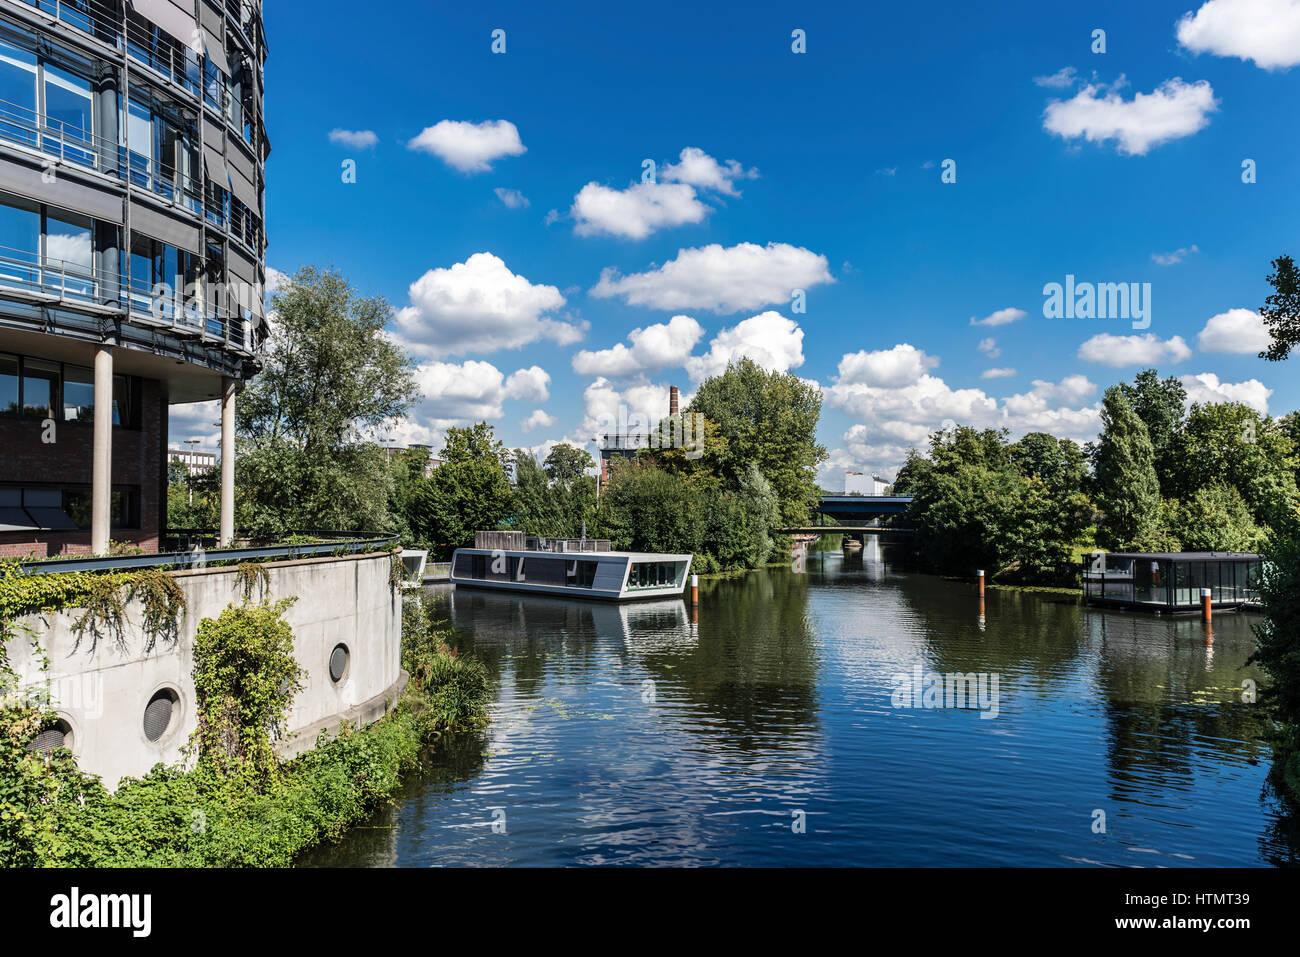 Floating houses on Victoriakai, Hammerbrook, Hamburg, Germany ...